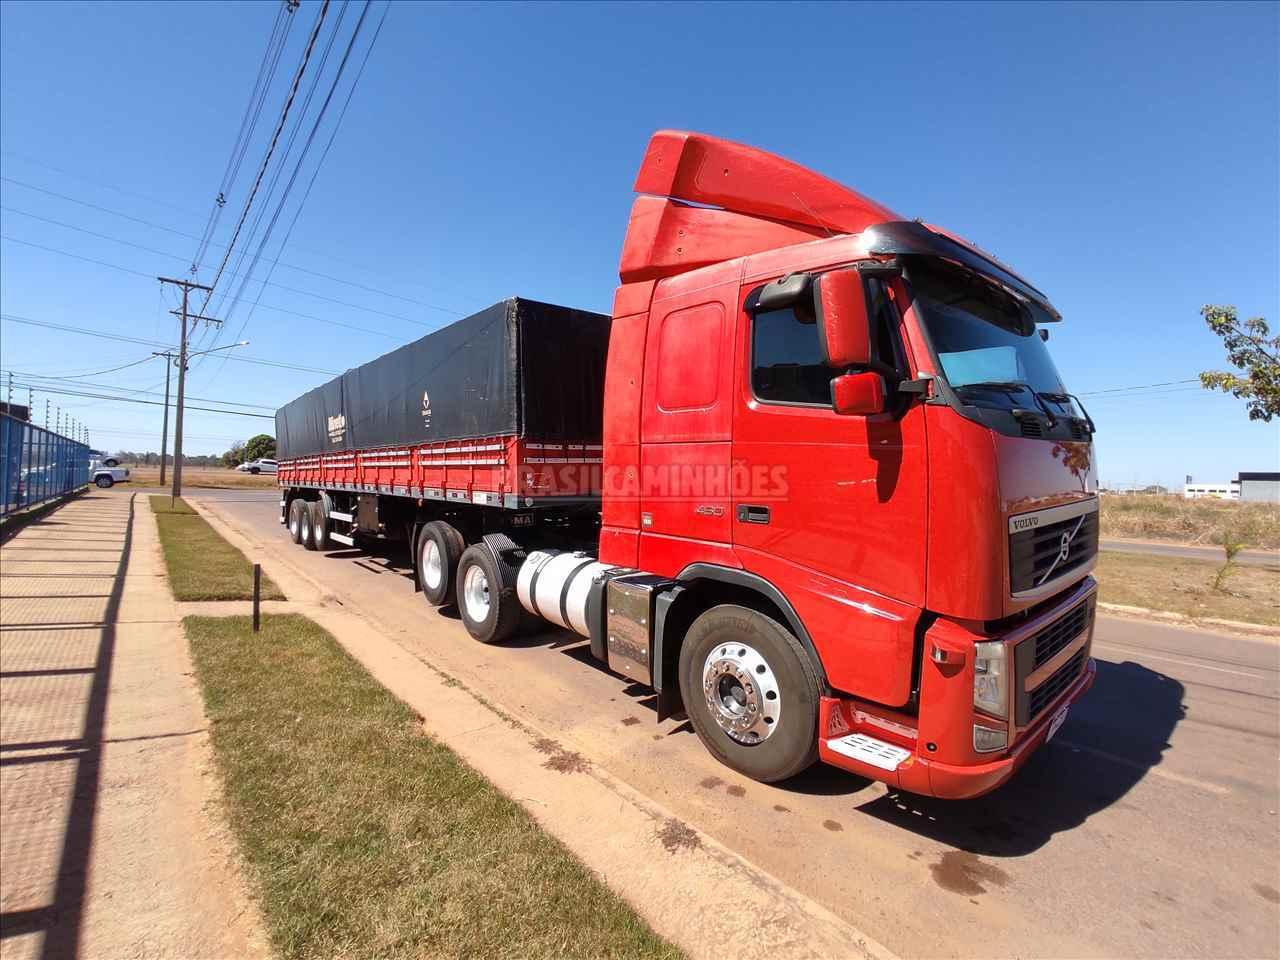 CAMINHAO VOLVO VOLVO FH 460 Carga Seca Truck 6x2 Brasil Caminhões Sinop SINOP MATO GROSSO MT